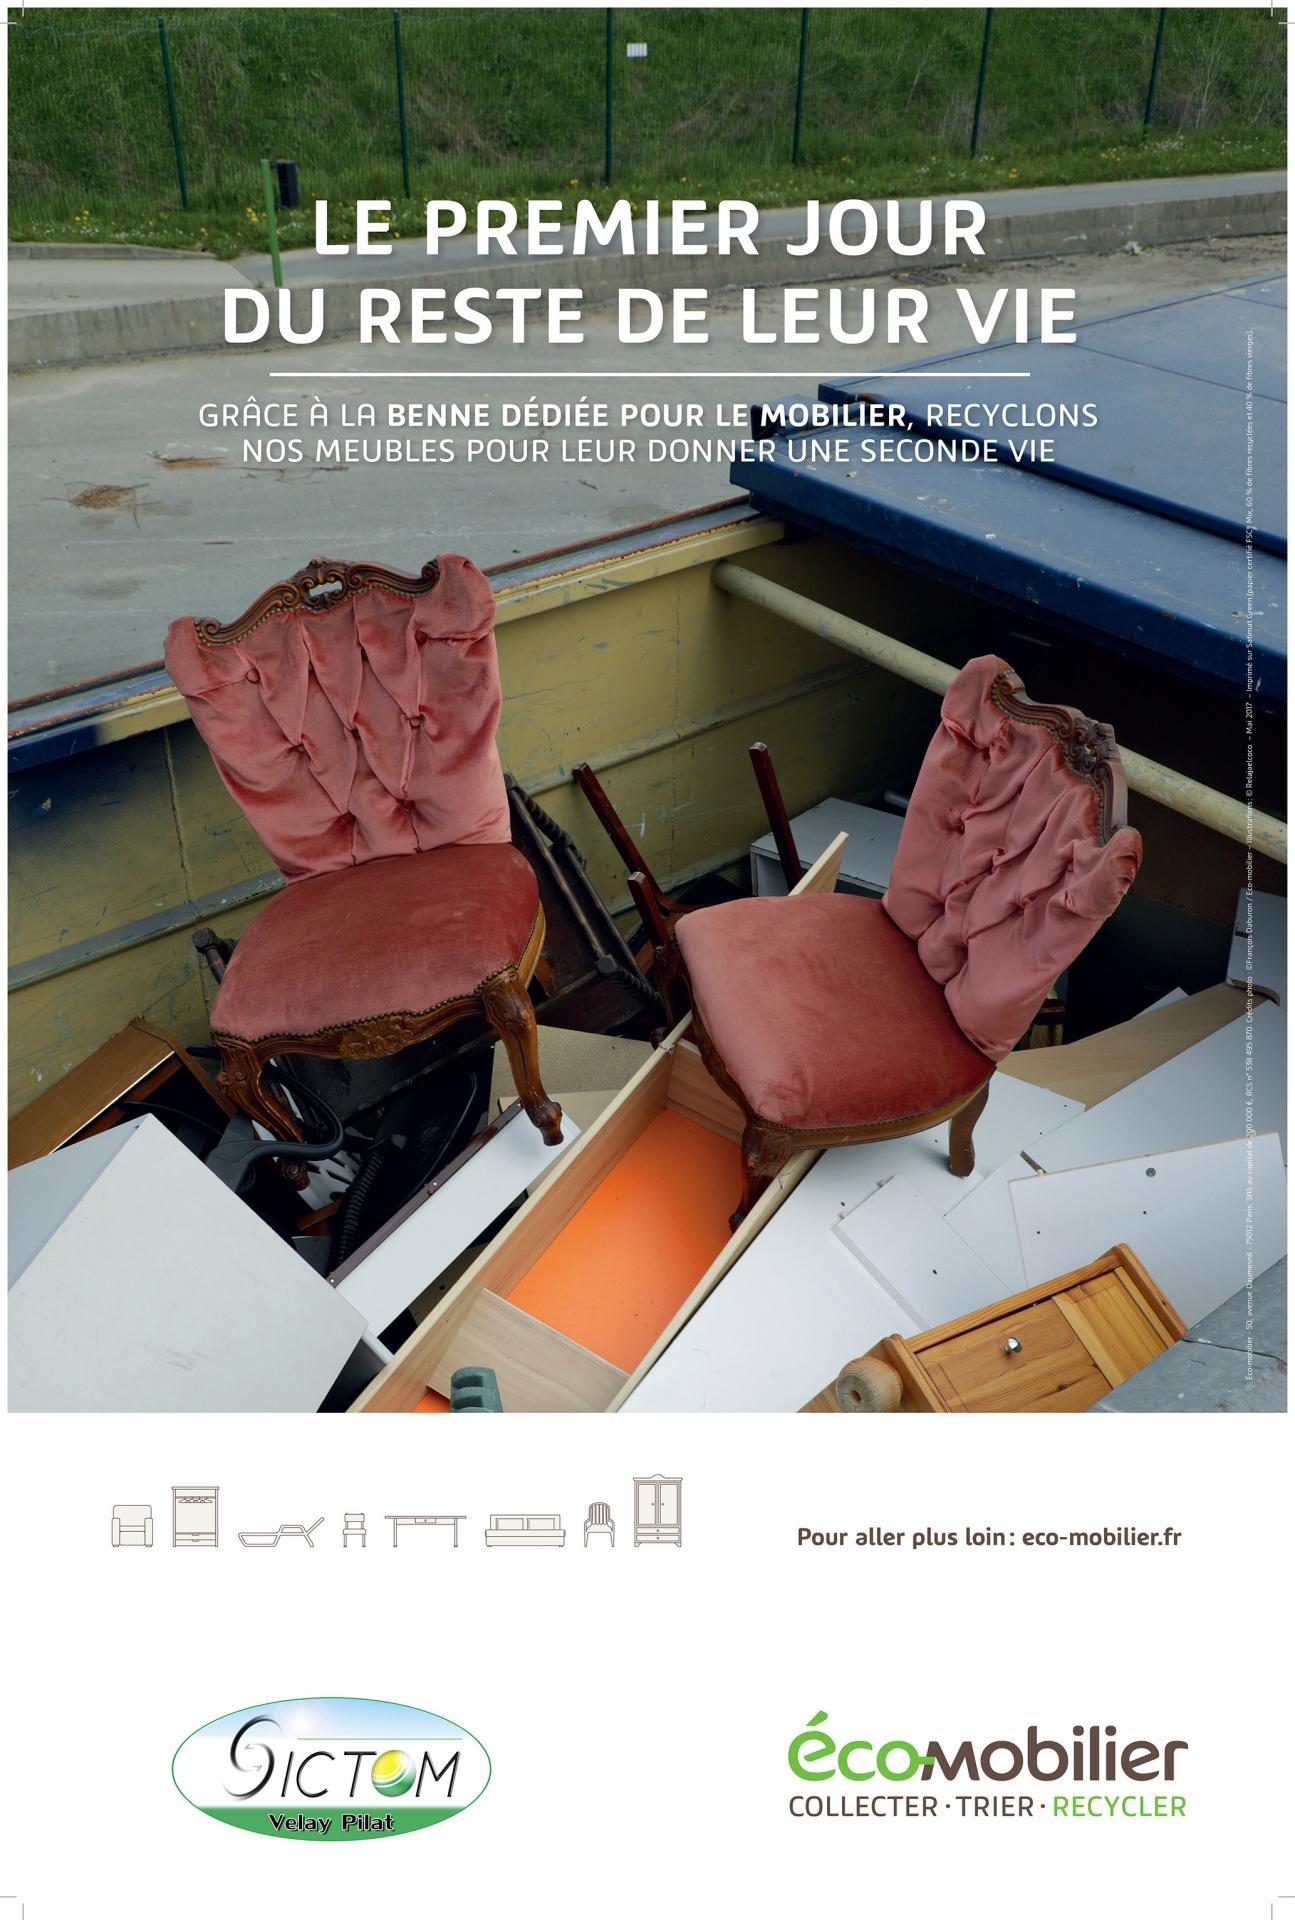 Imp affiche collectivites locales 40x60 eco mobilier 110517 1